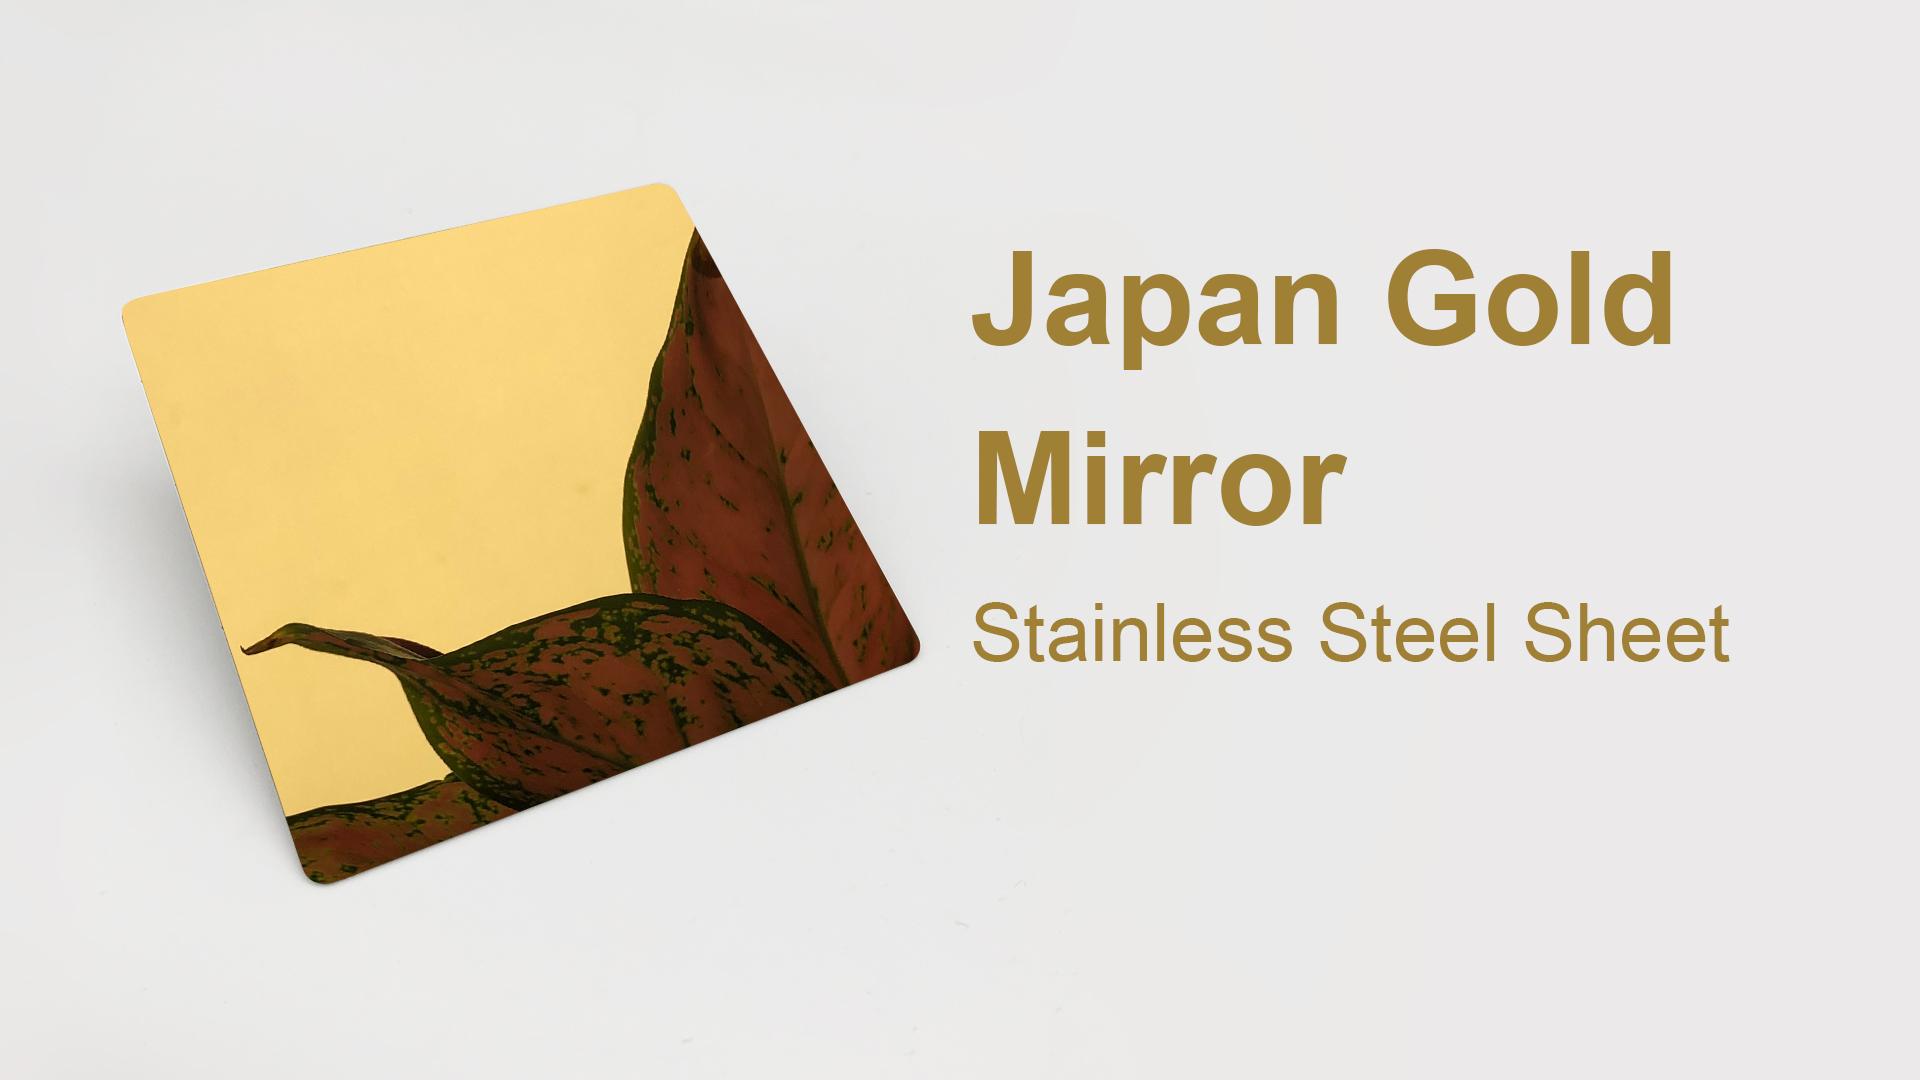 Japan Gold Mirror